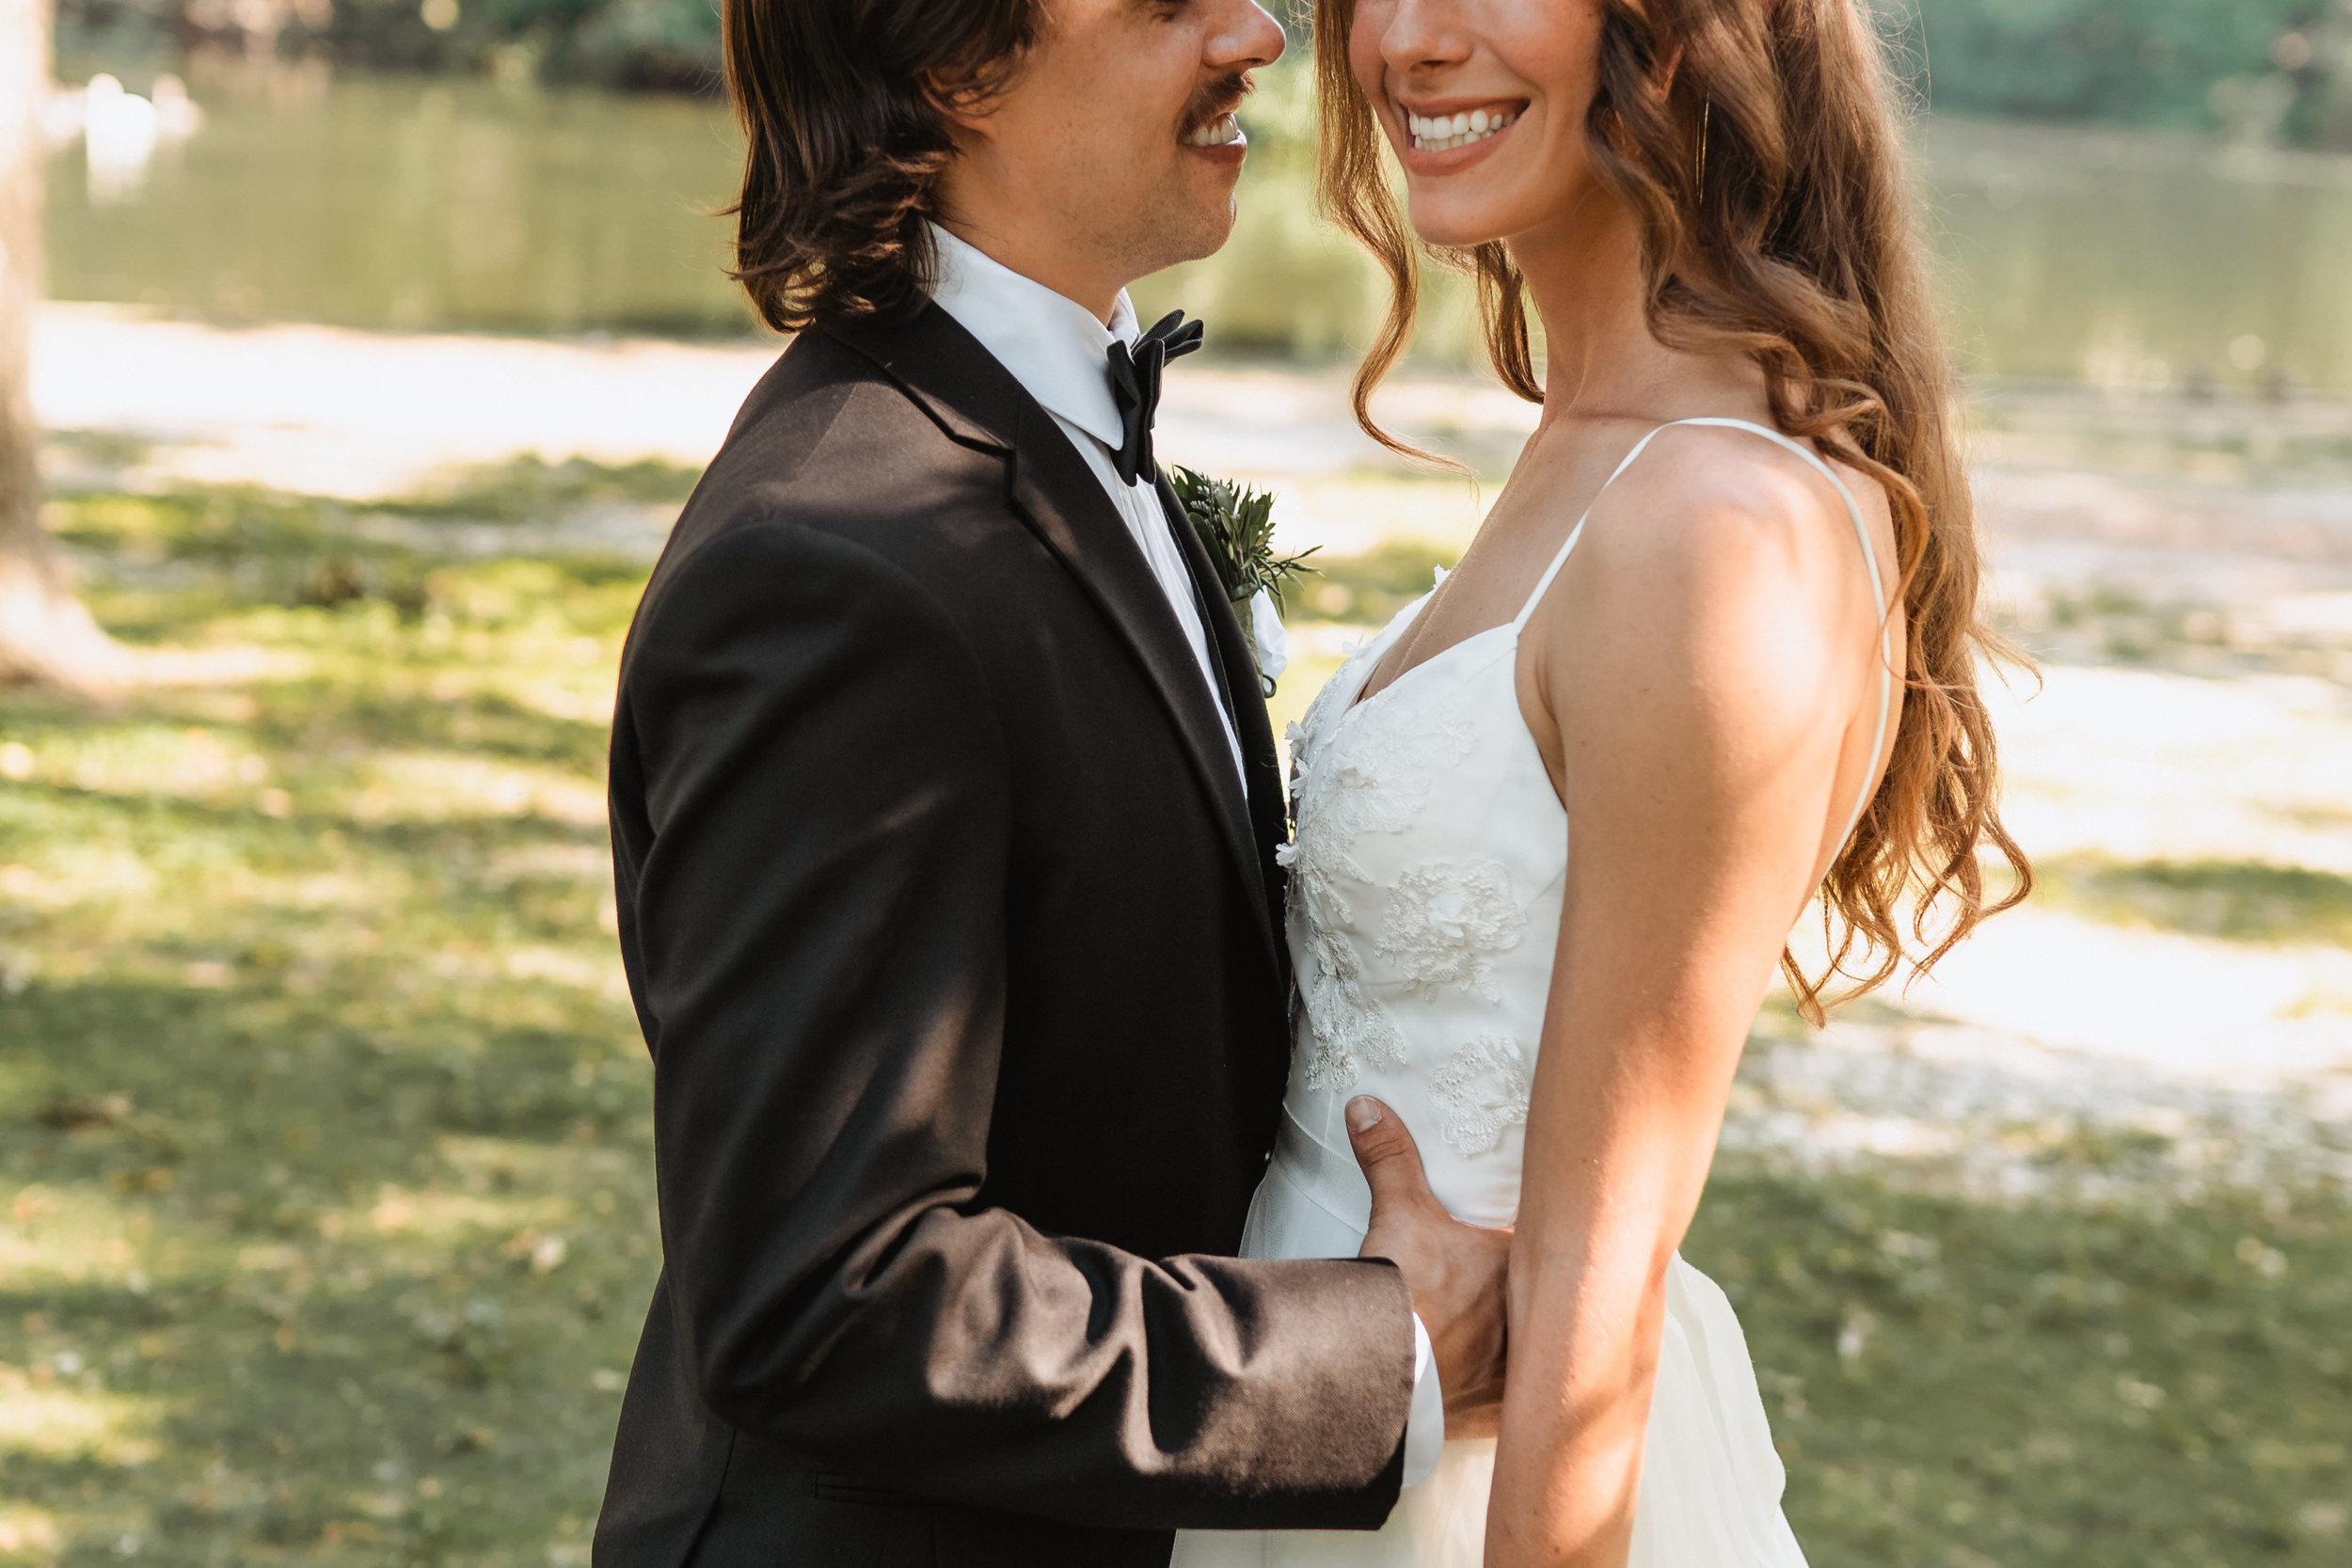 JJP_Emily&Joey_Summer_Old Field Club Wedding_31.jpg